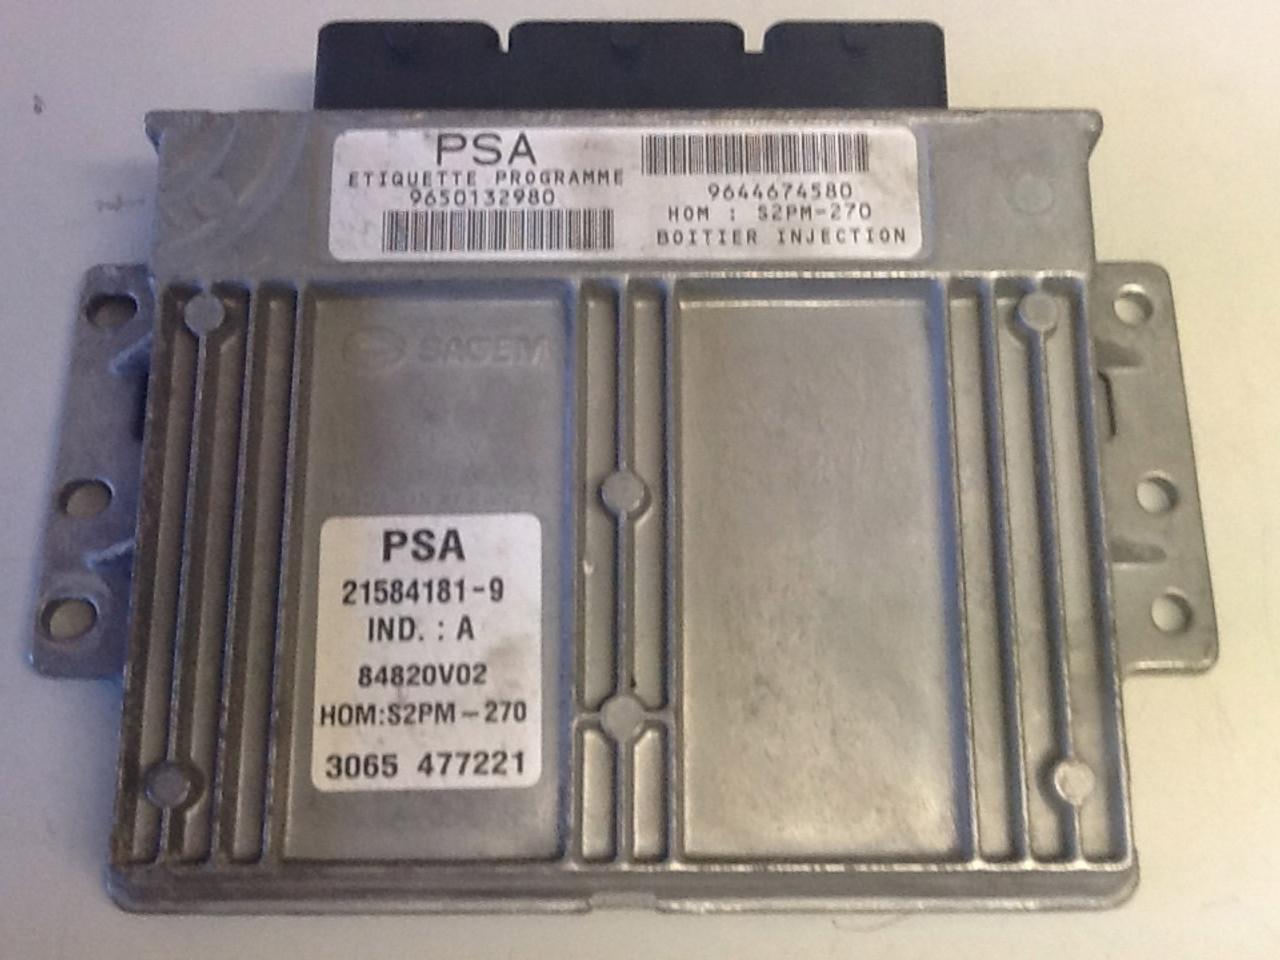 Plug & Play Engine ECU, PSA, S2PM-270